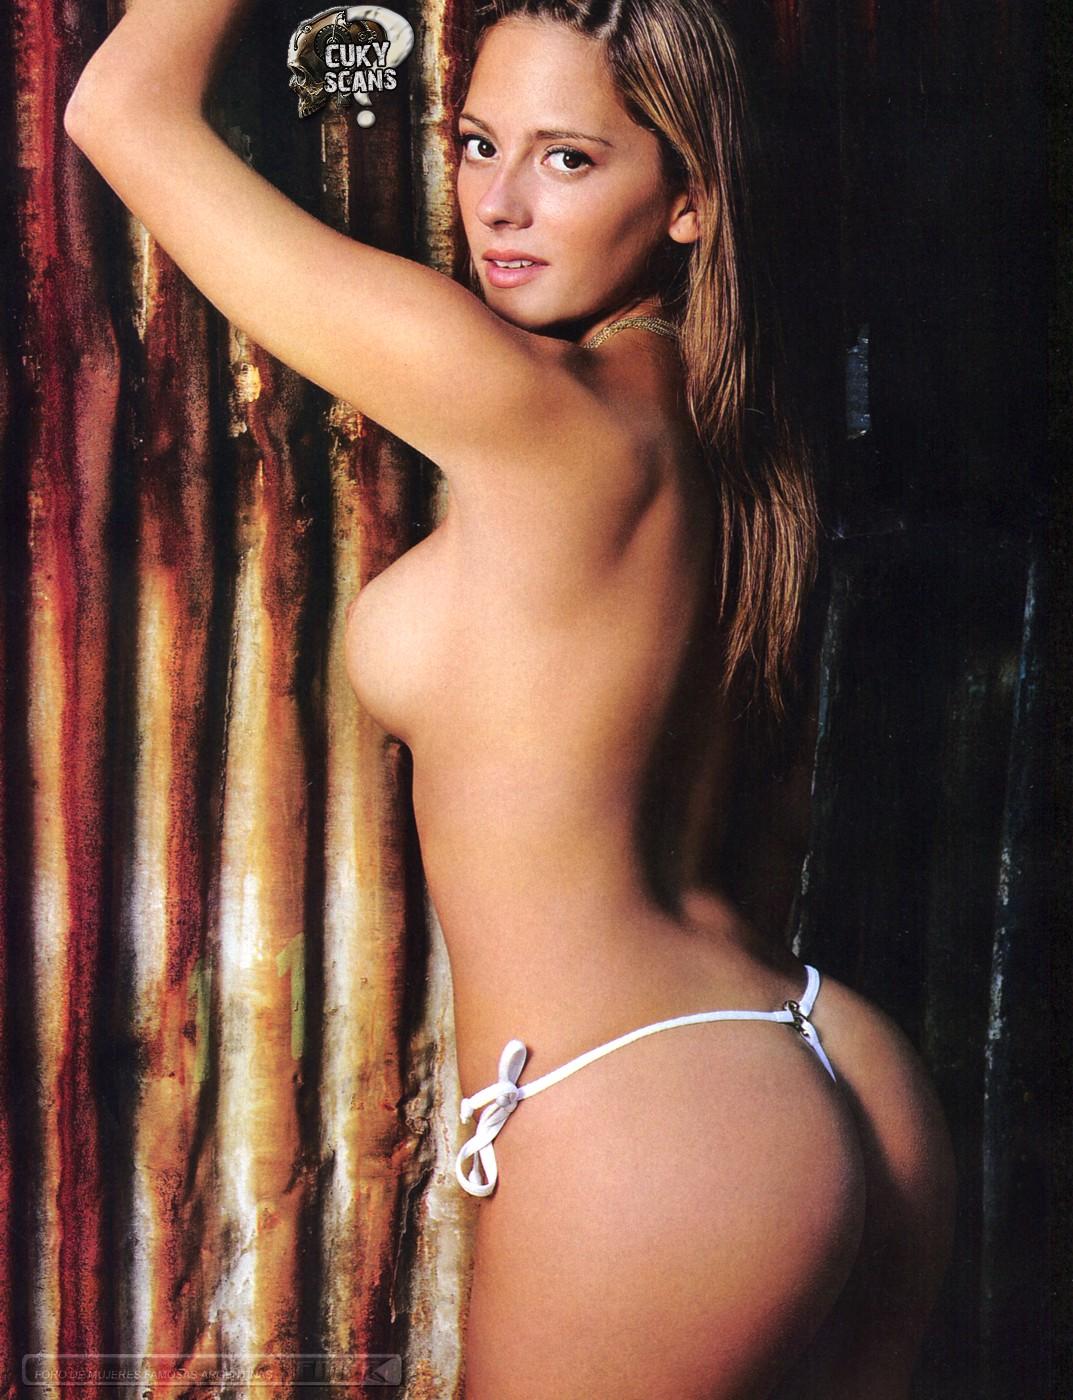 maxim magazine models nude